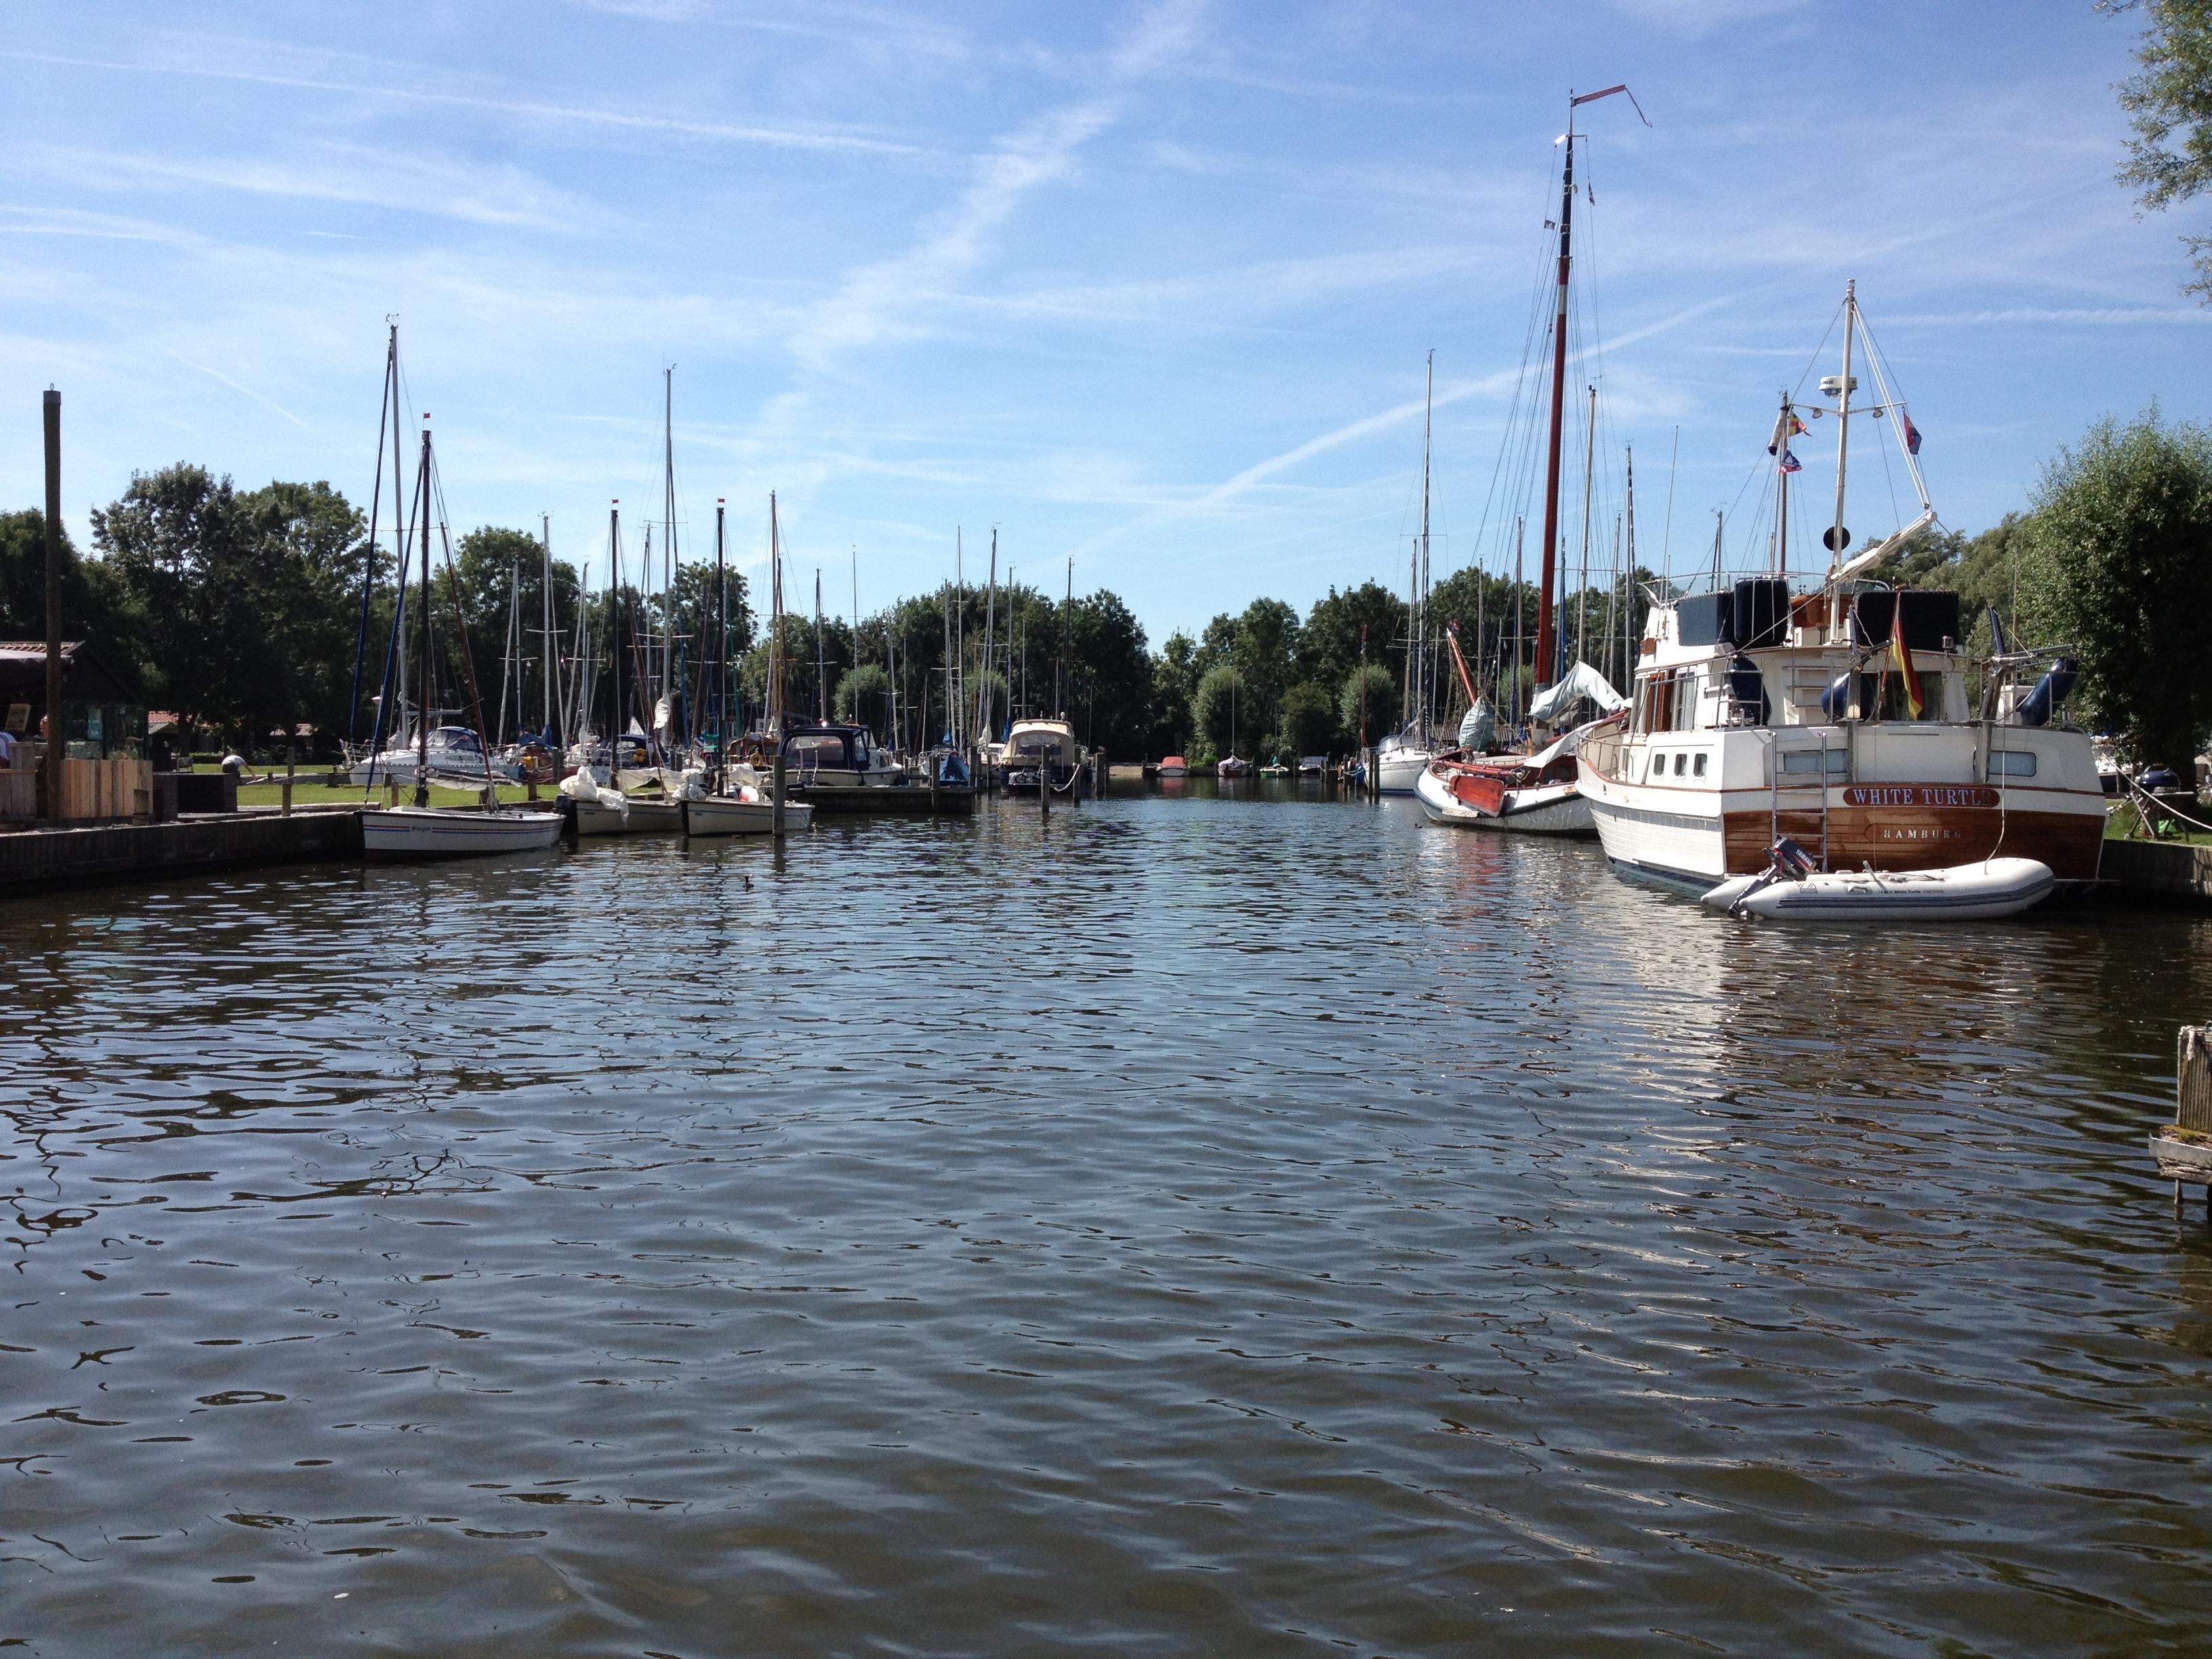 Jachthaven de Koggeplaet